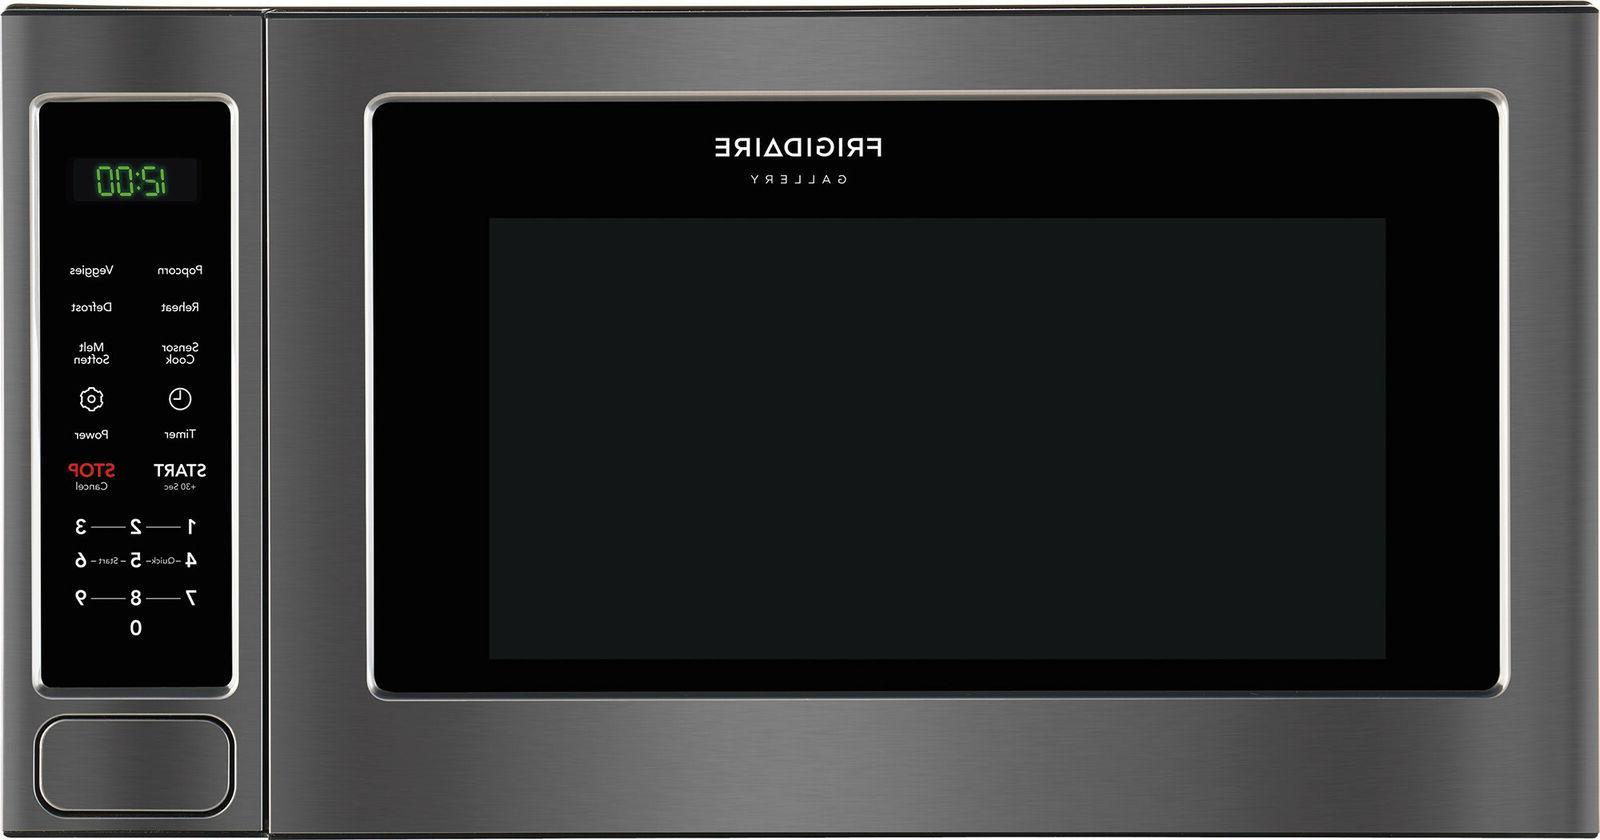 fgmo206ntd gallery series countertop microwave